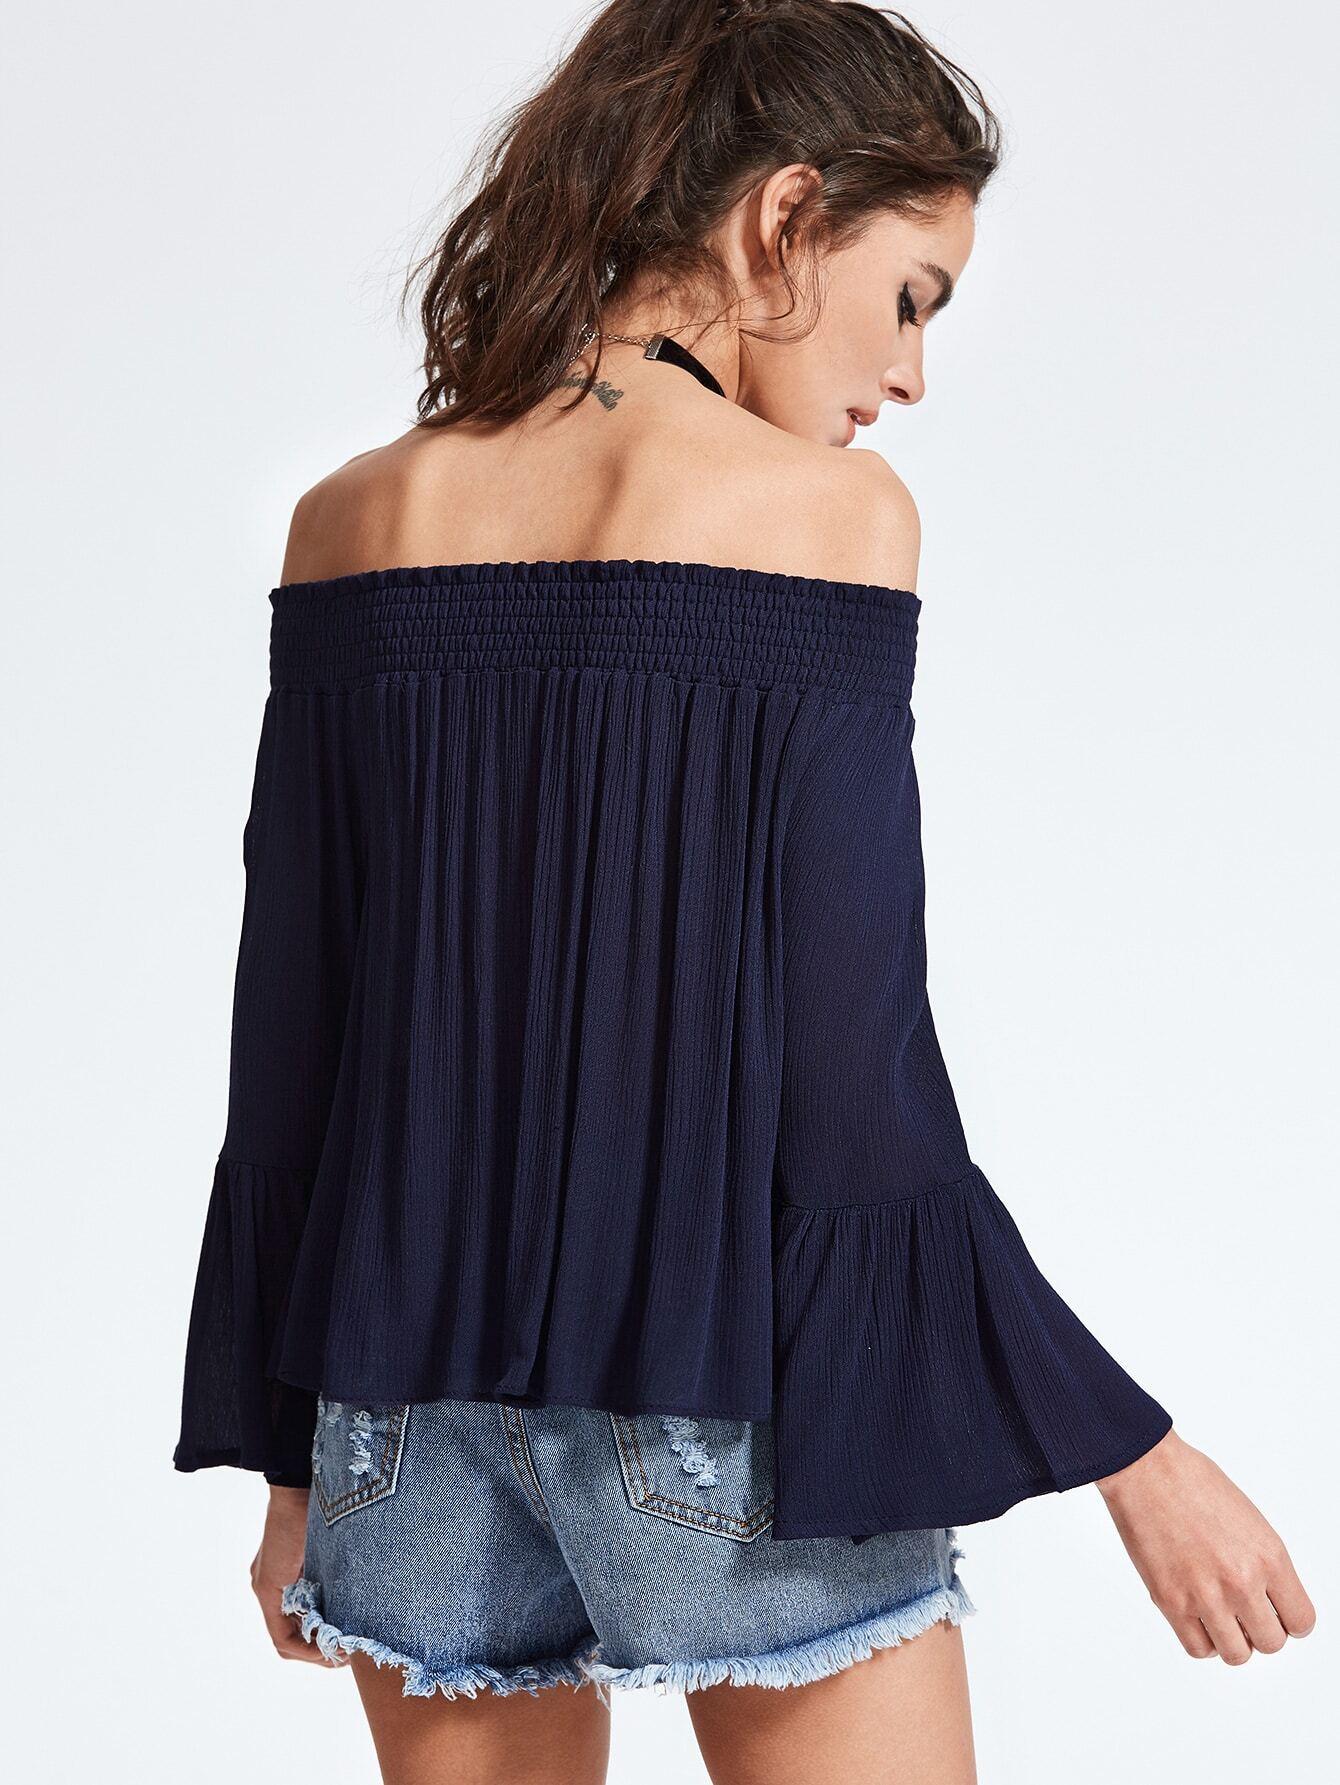 blouse170306003_2